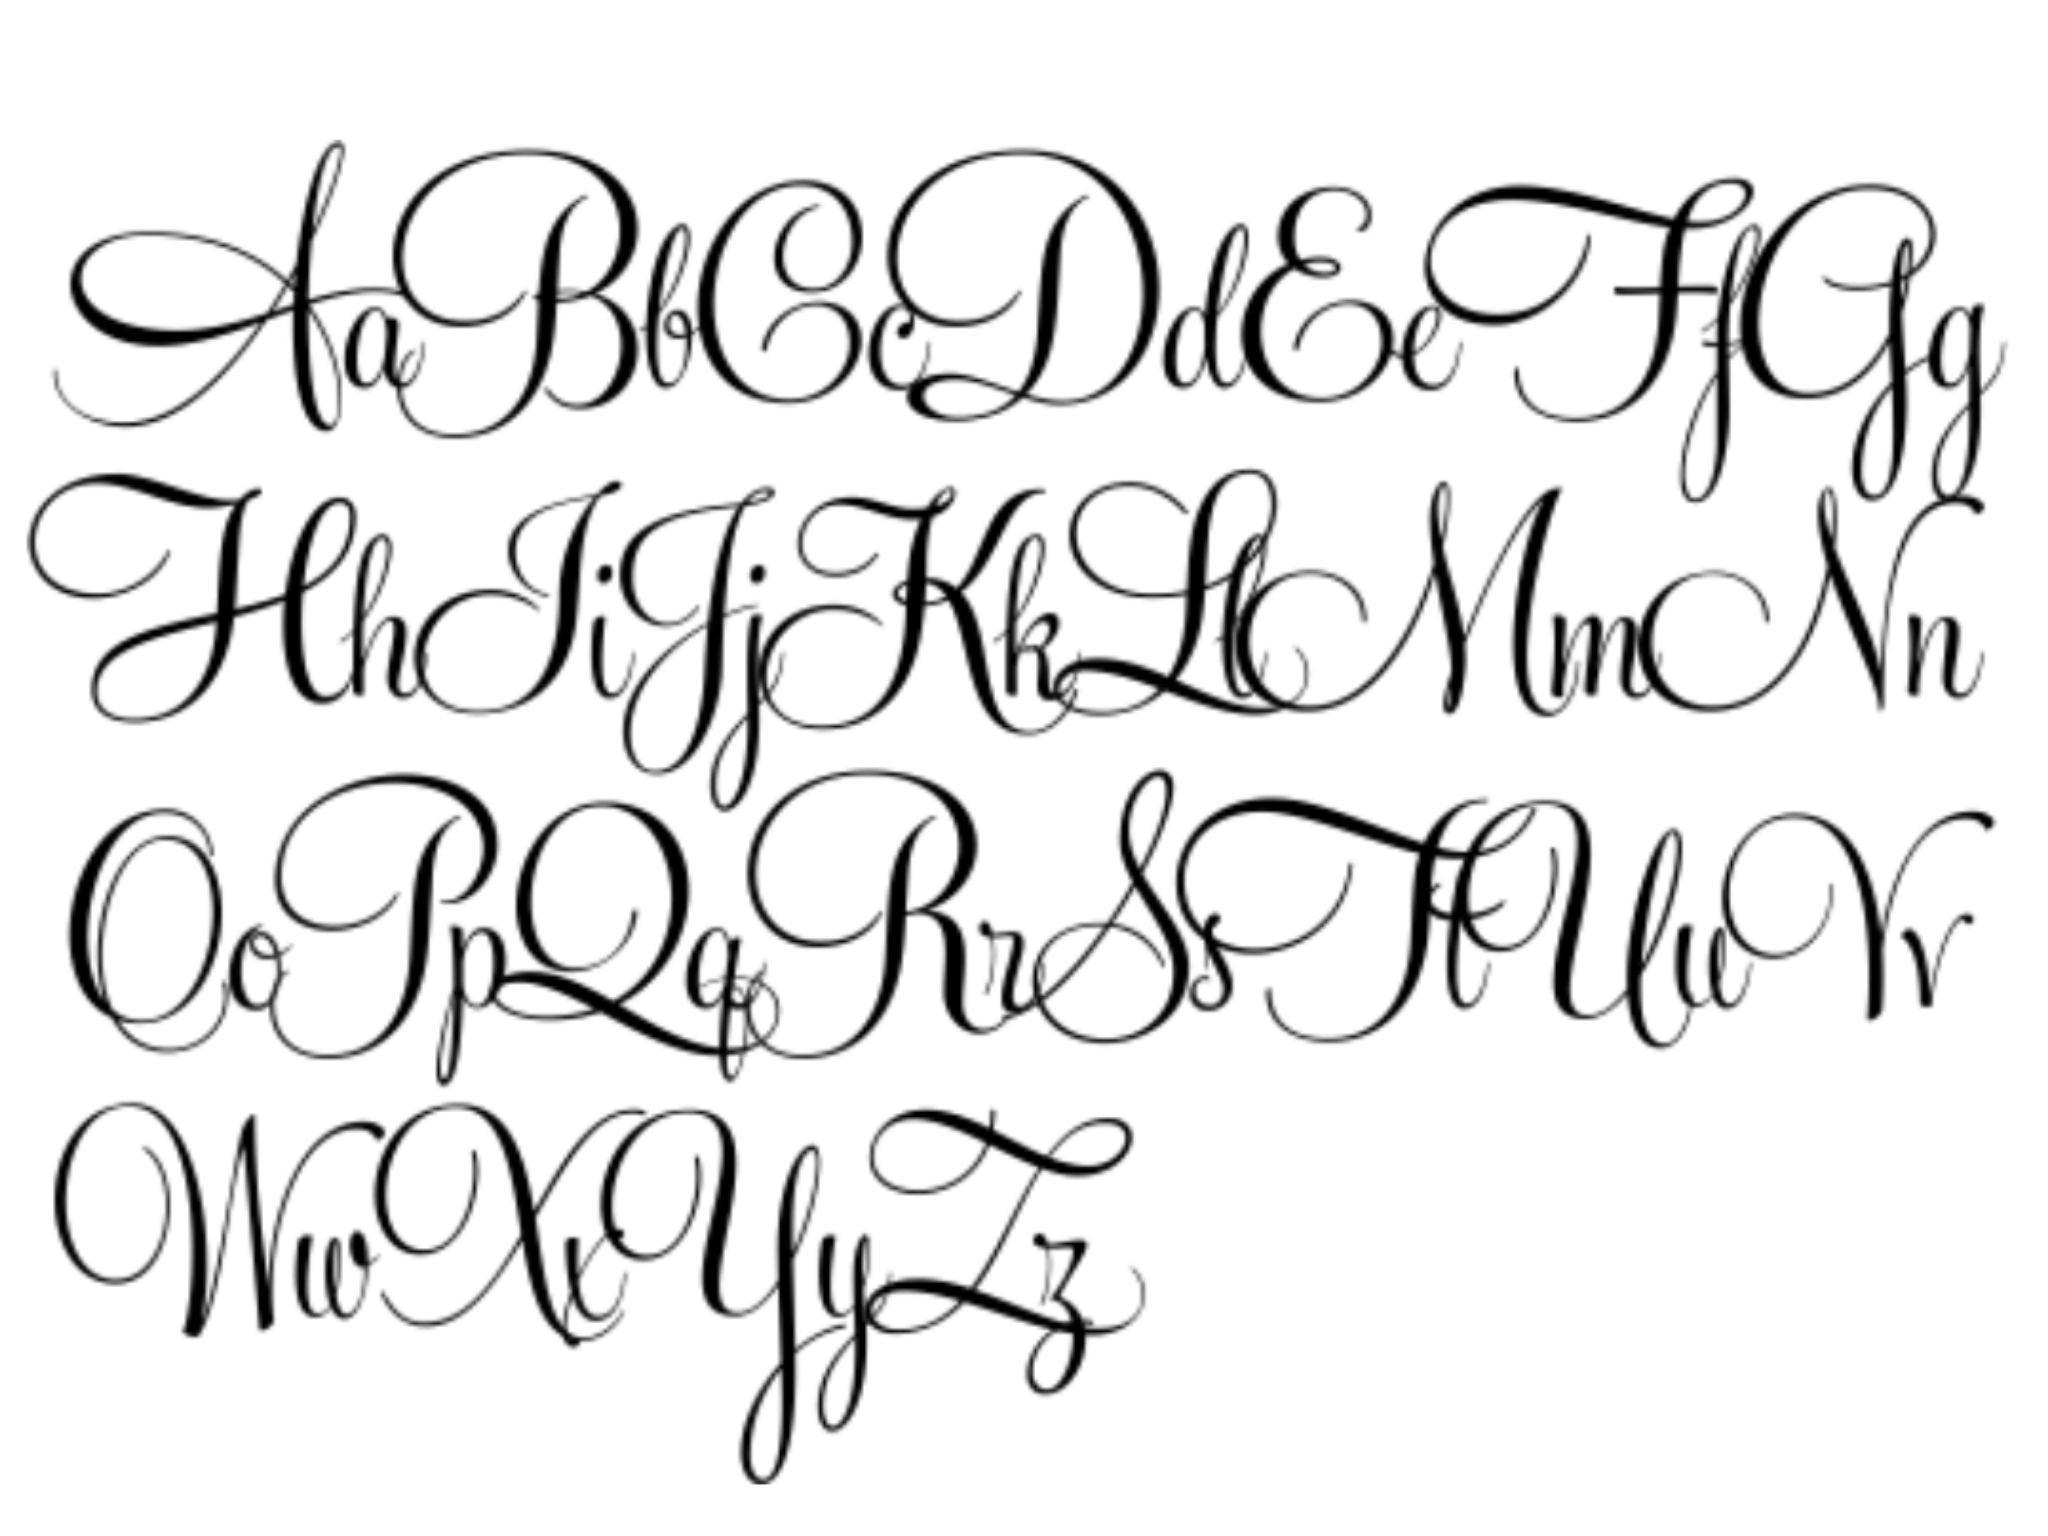 pin by carla sanchez on alphabet fonts | pinterest | fonts